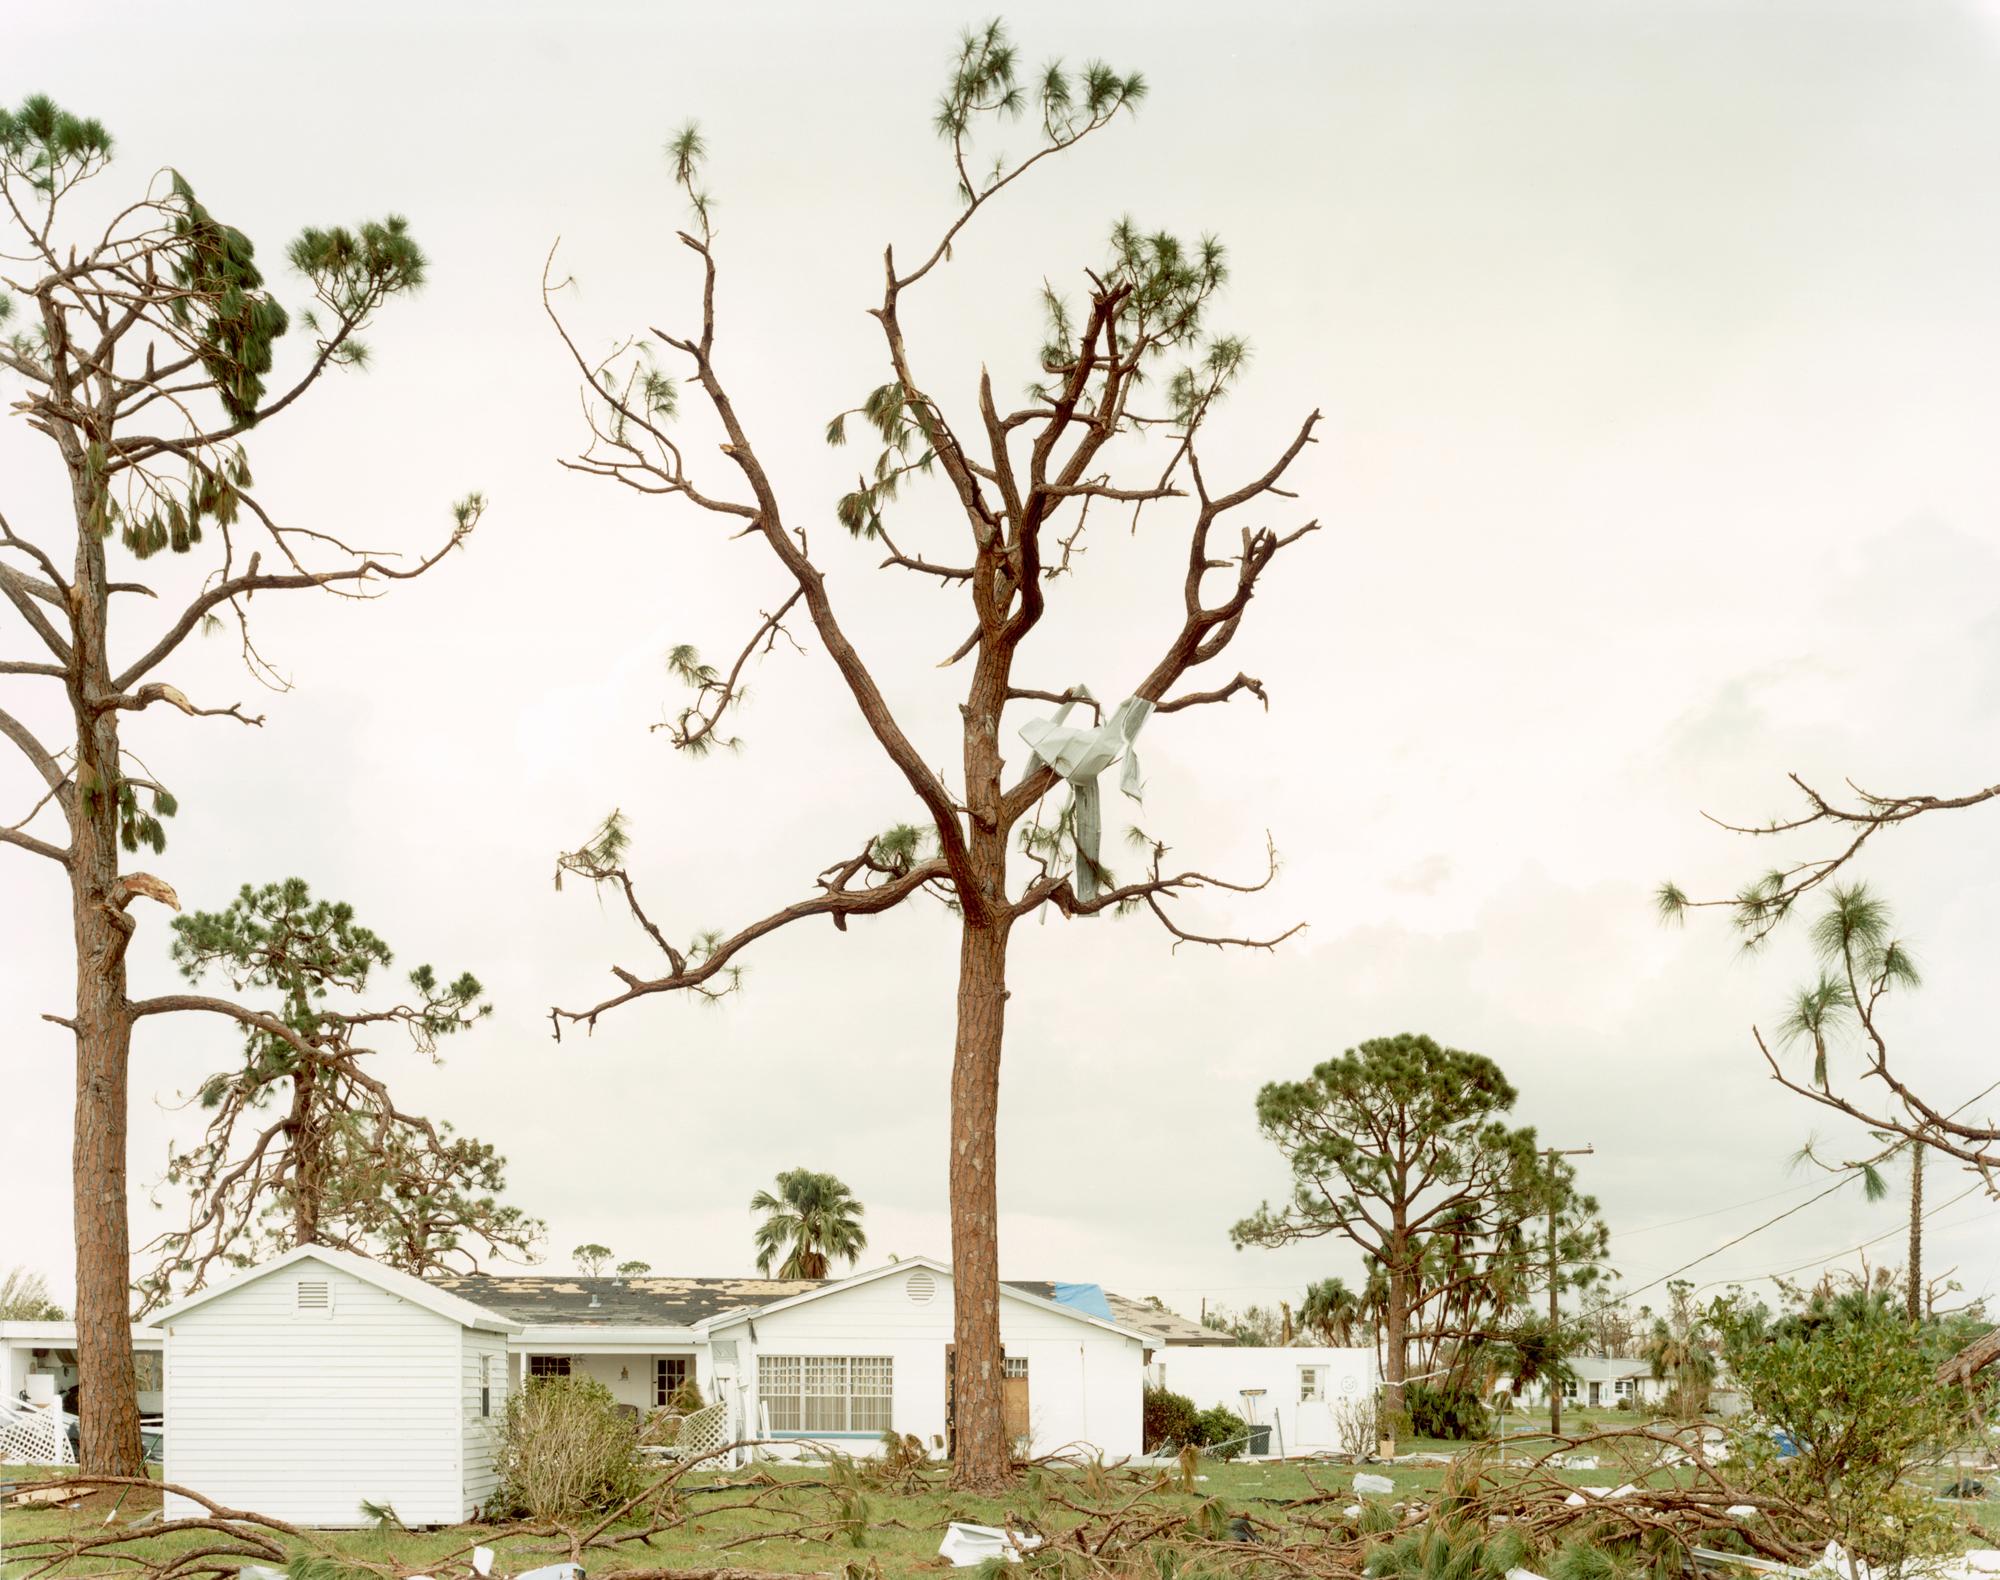 Sasha Bezzubov, Hurricane #4, Florida, 2004